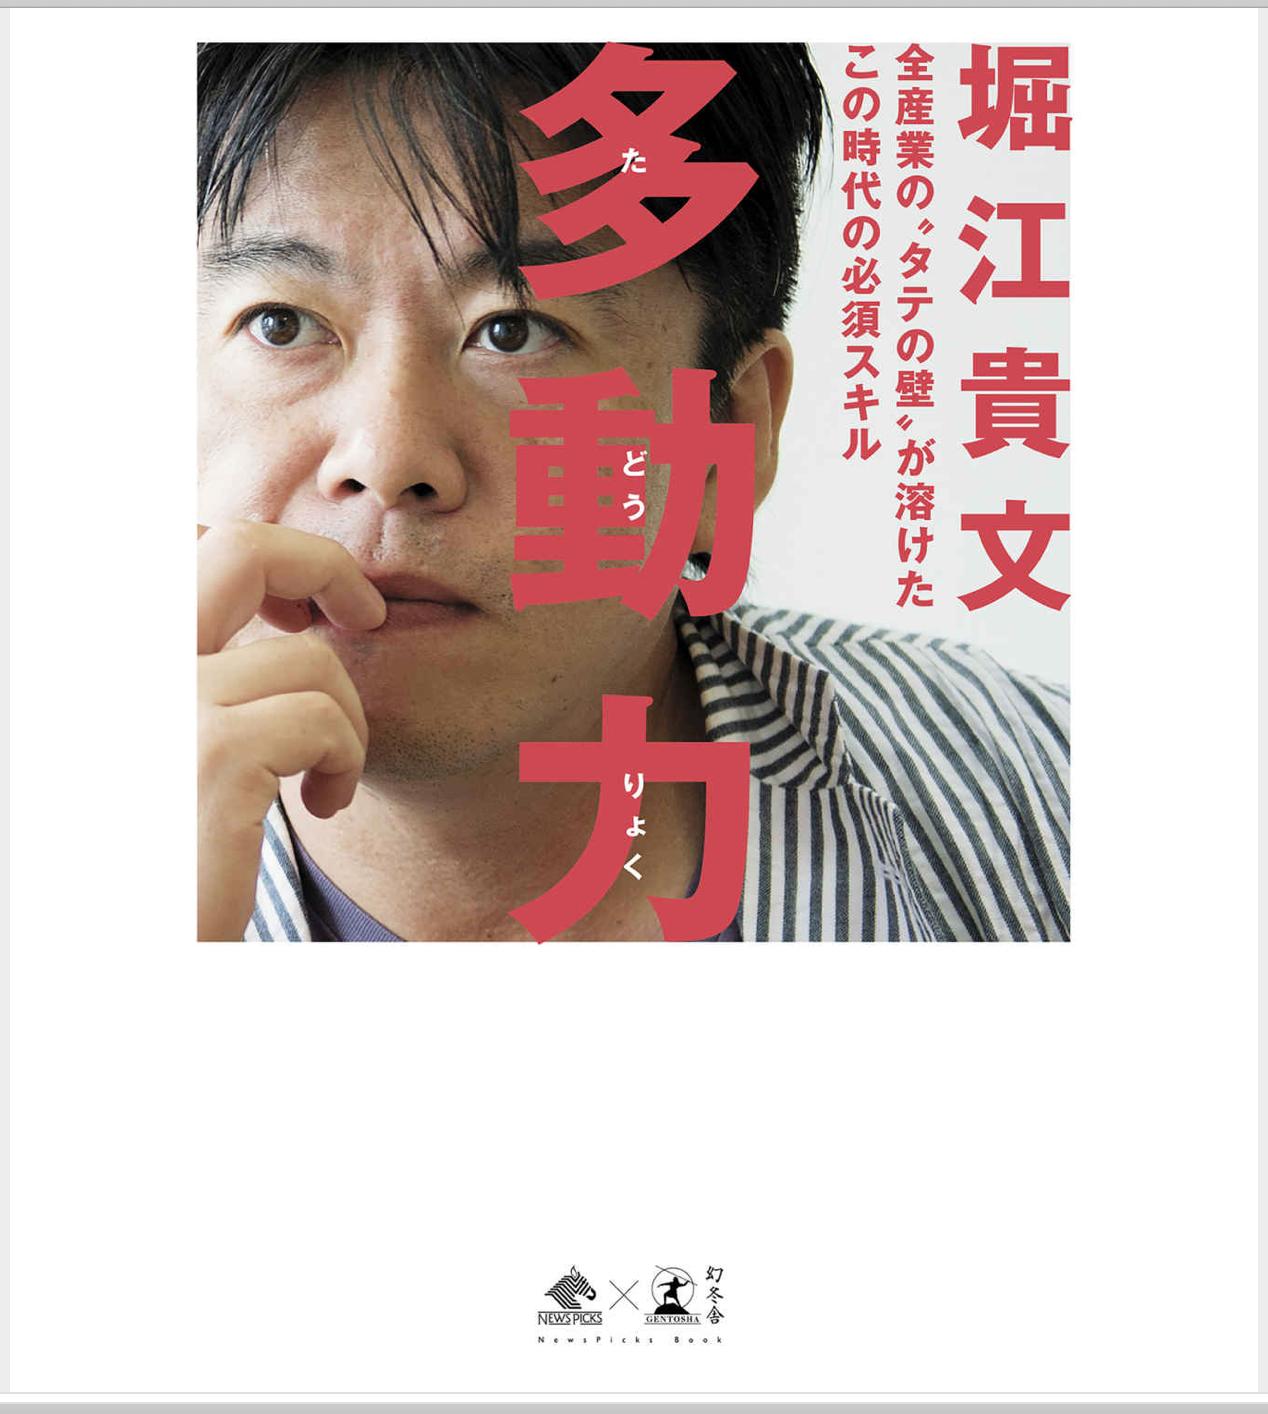 書評】多動力/堀江貴文 忘我多動の生き方